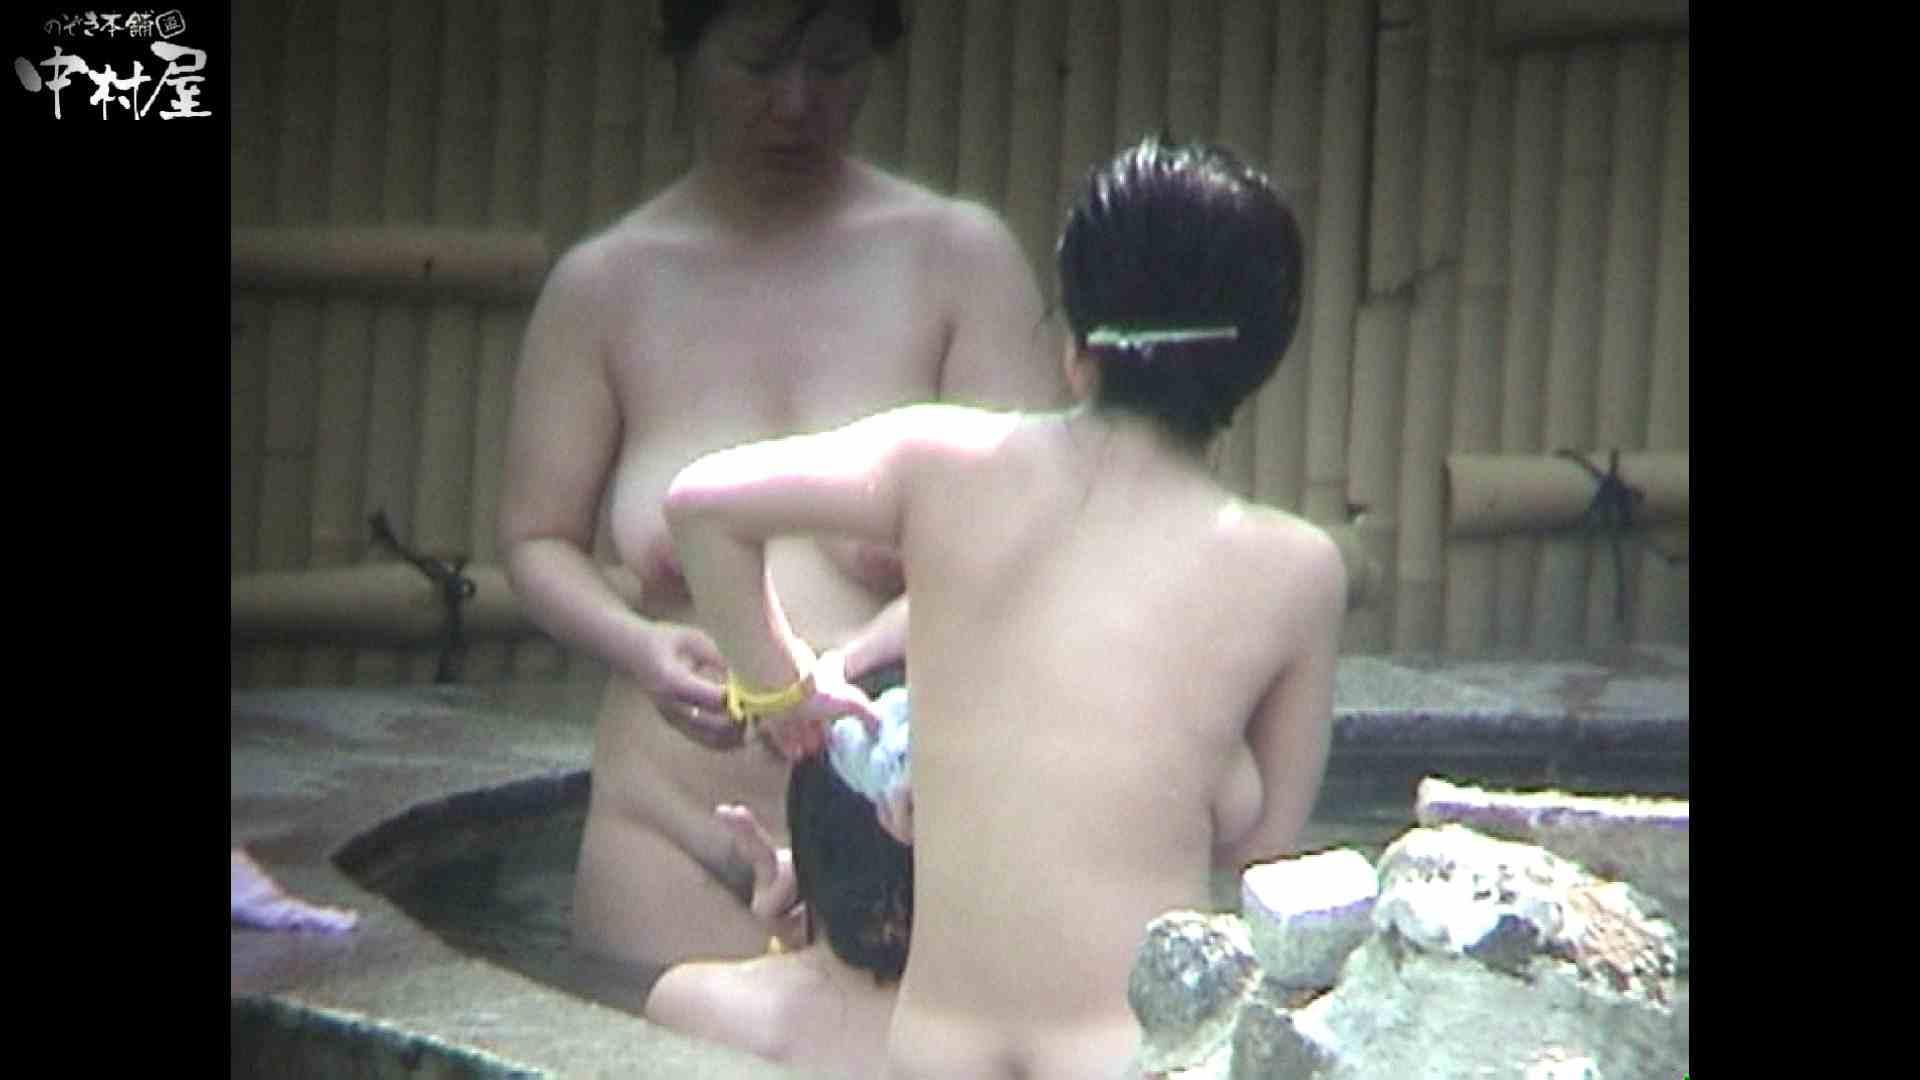 Aquaな露天風呂Vol.936 OLセックス 覗きぱこり動画紹介 75画像 71